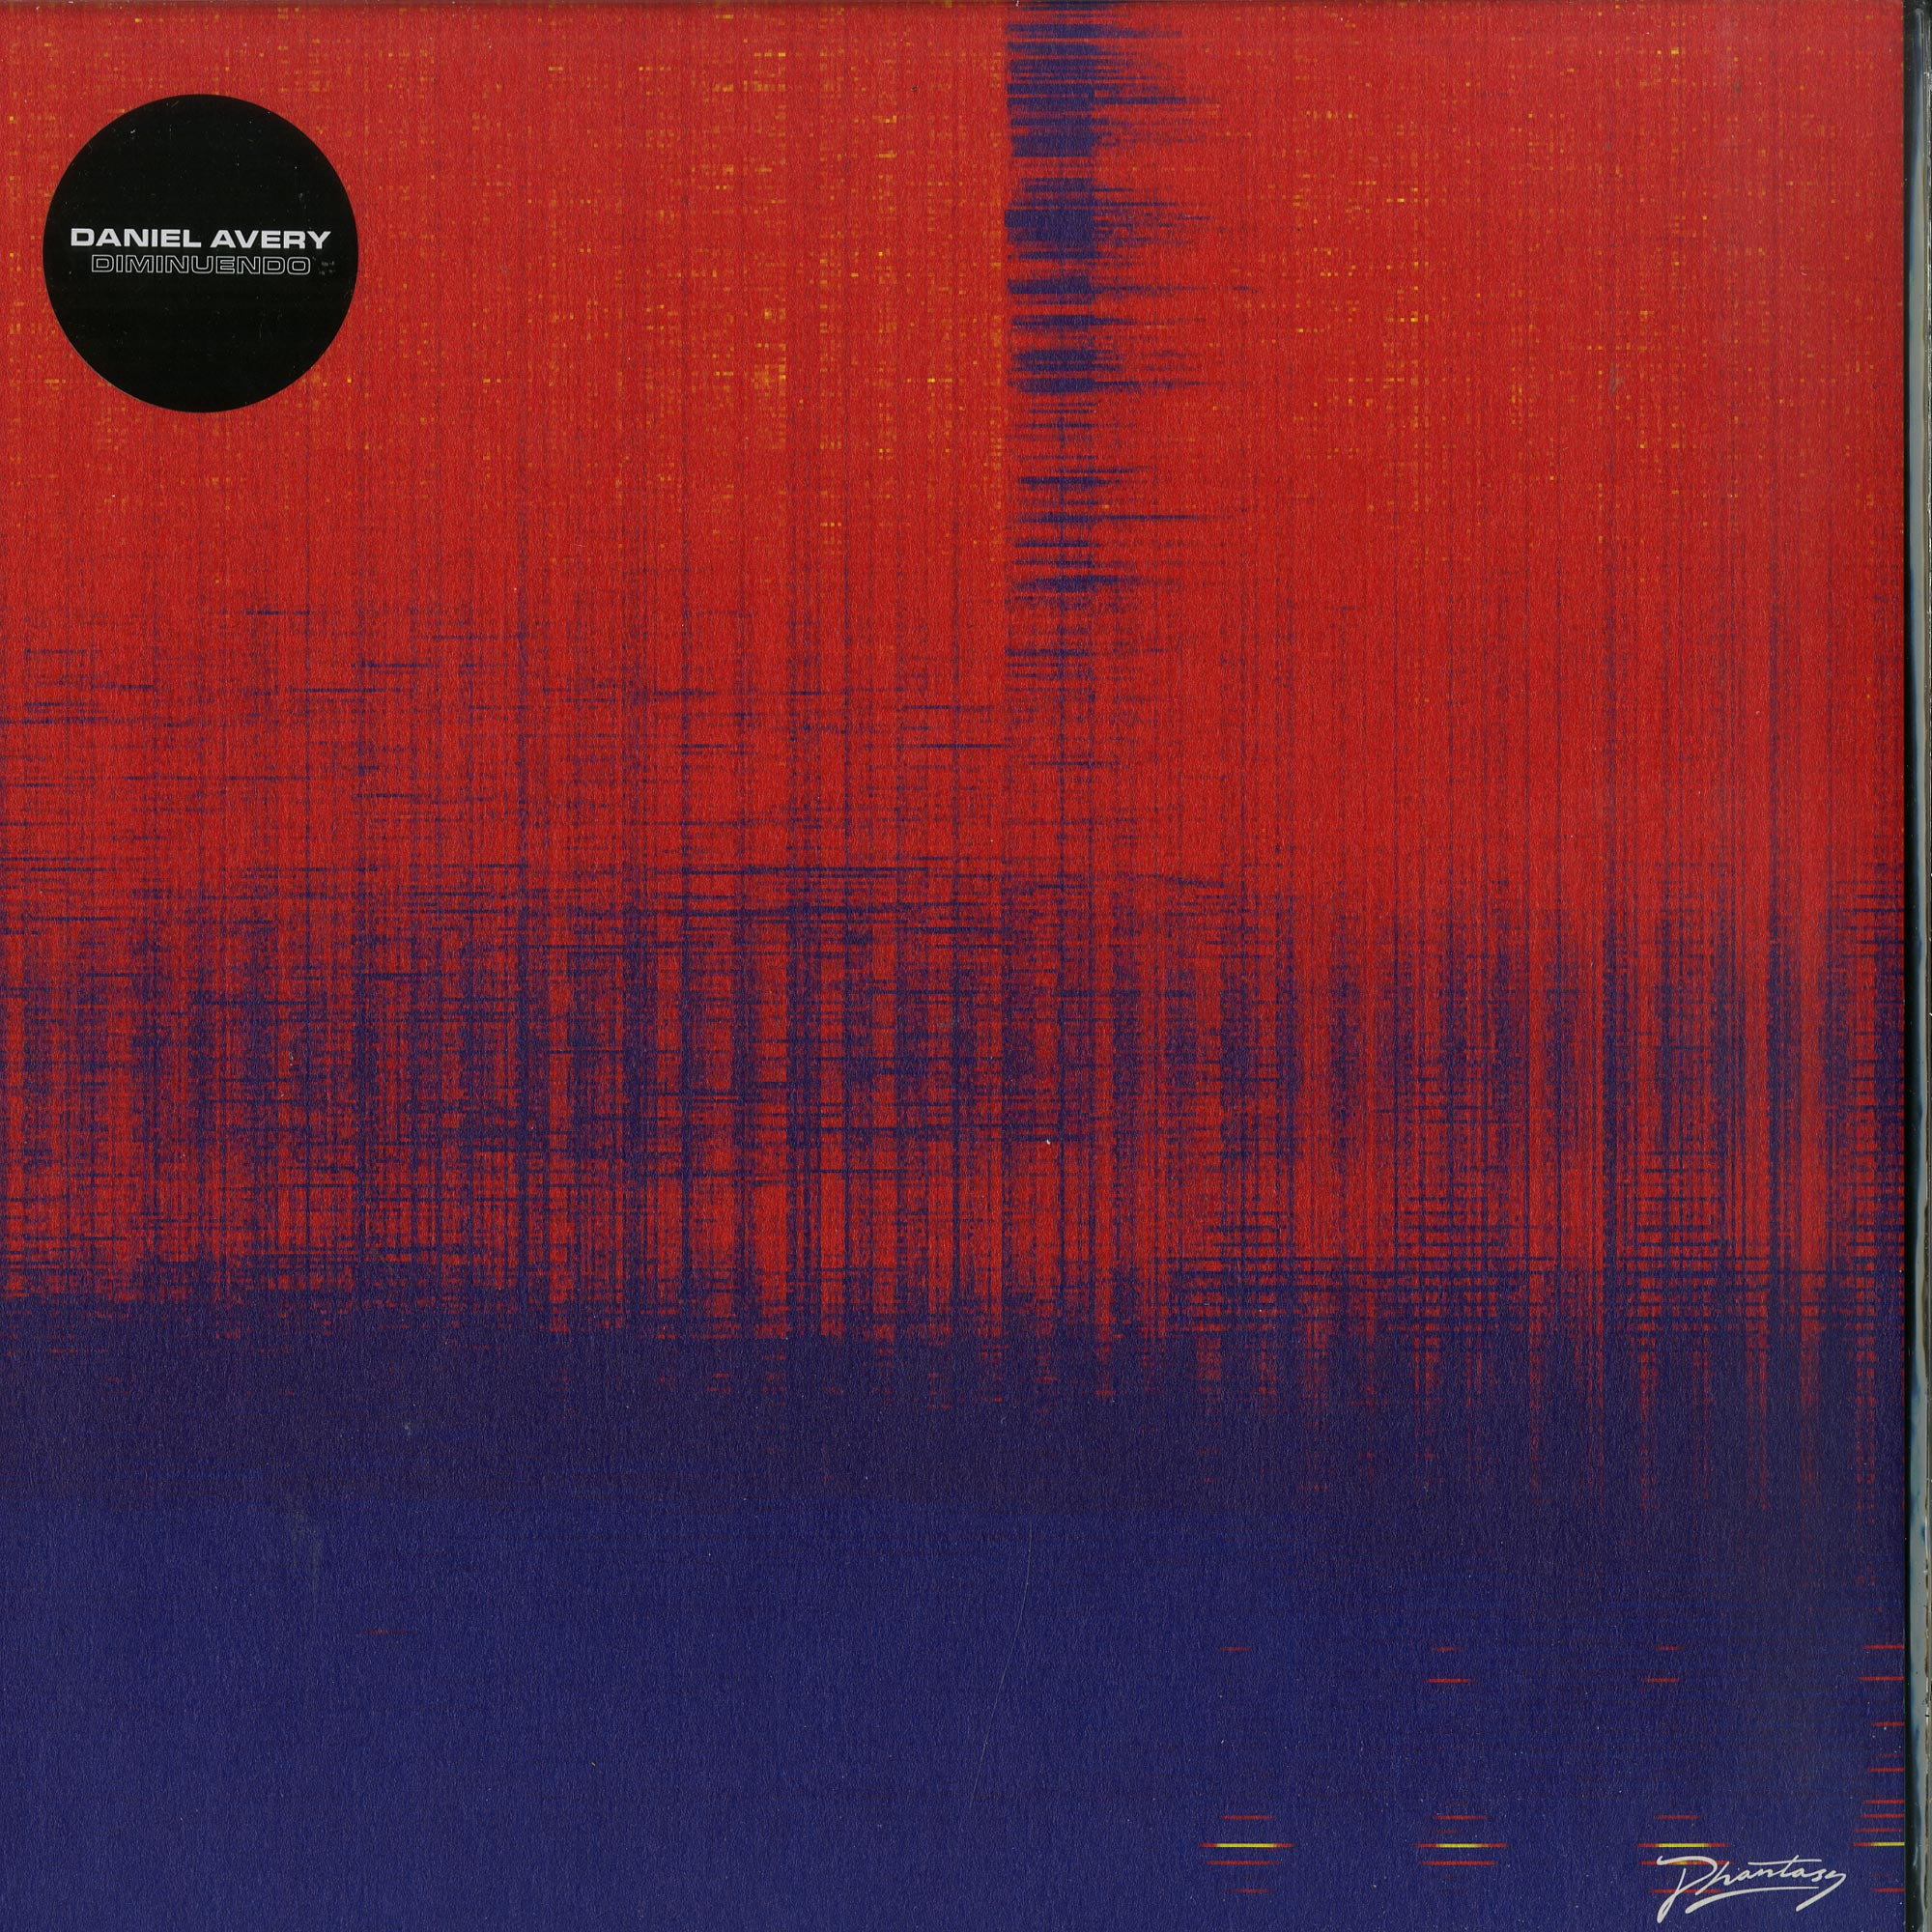 Daniel Avery - DIMINUENDO EP